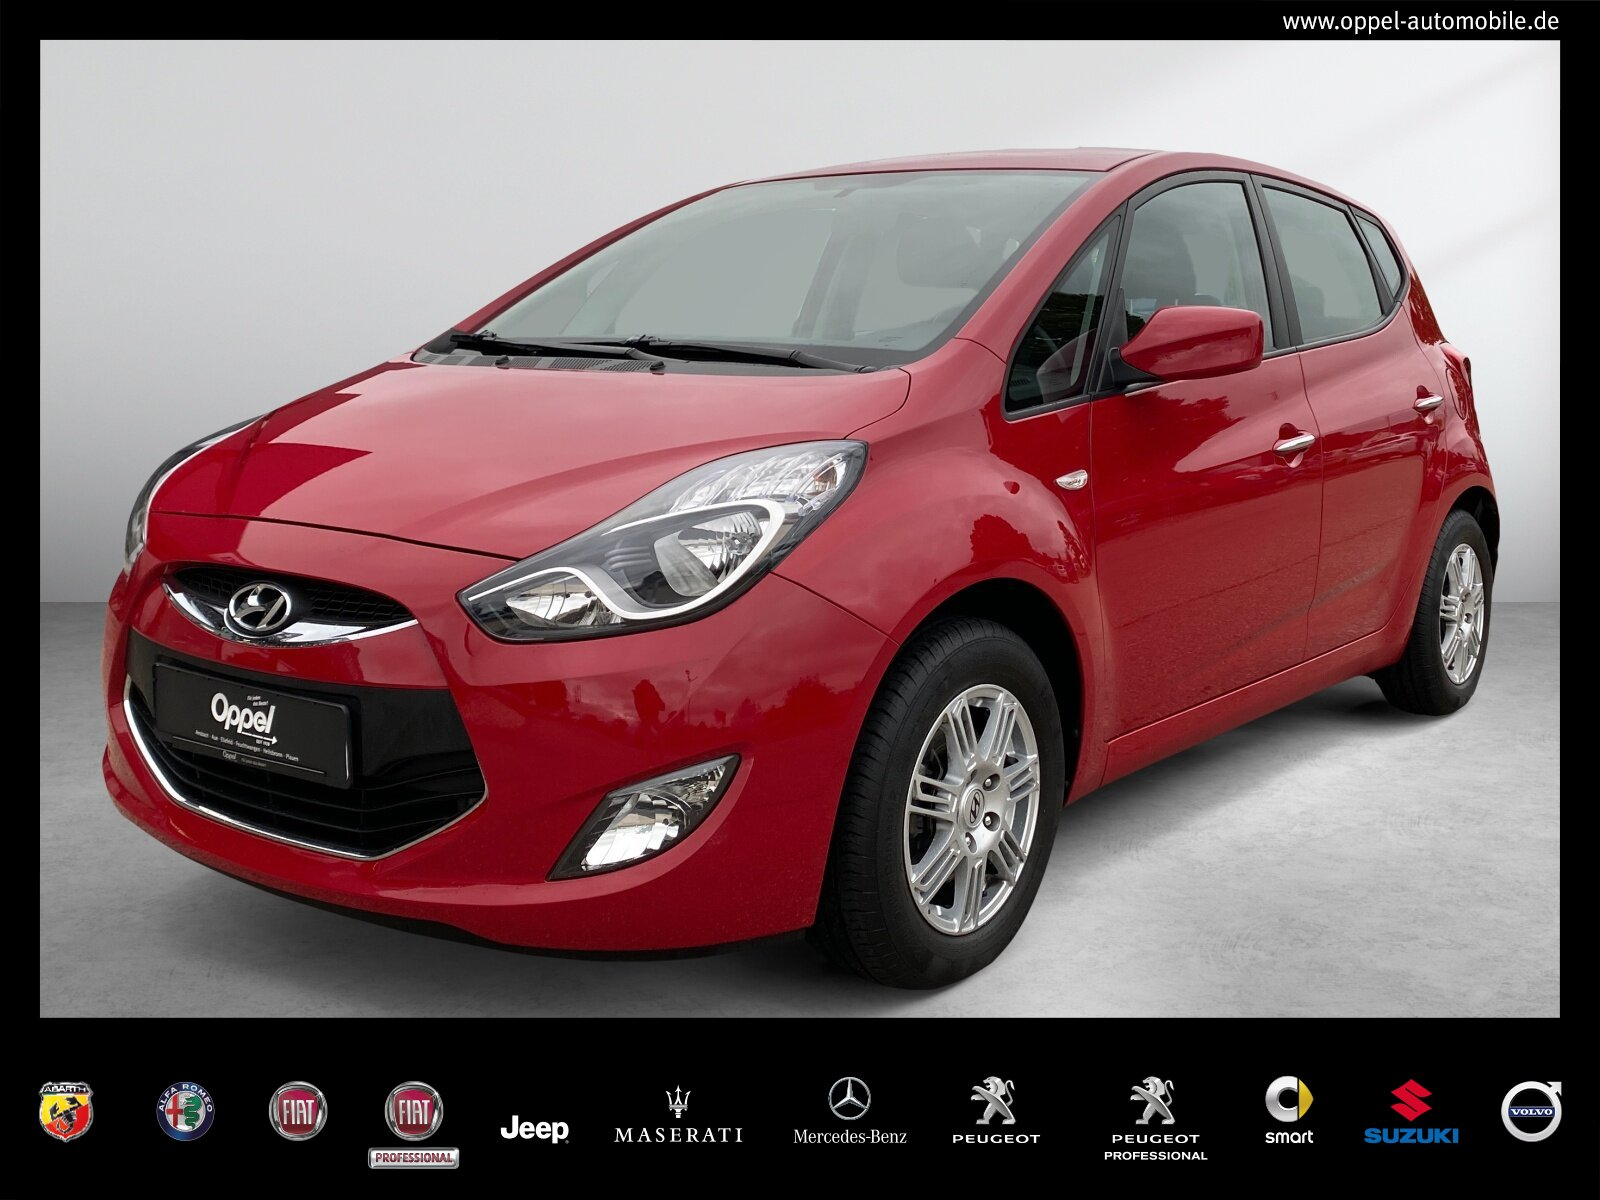 Hyundai Ix20 1.4 FIFA World Cup Edition +KLIMA+SITZH.+BC, Jahr 2014, Benzin